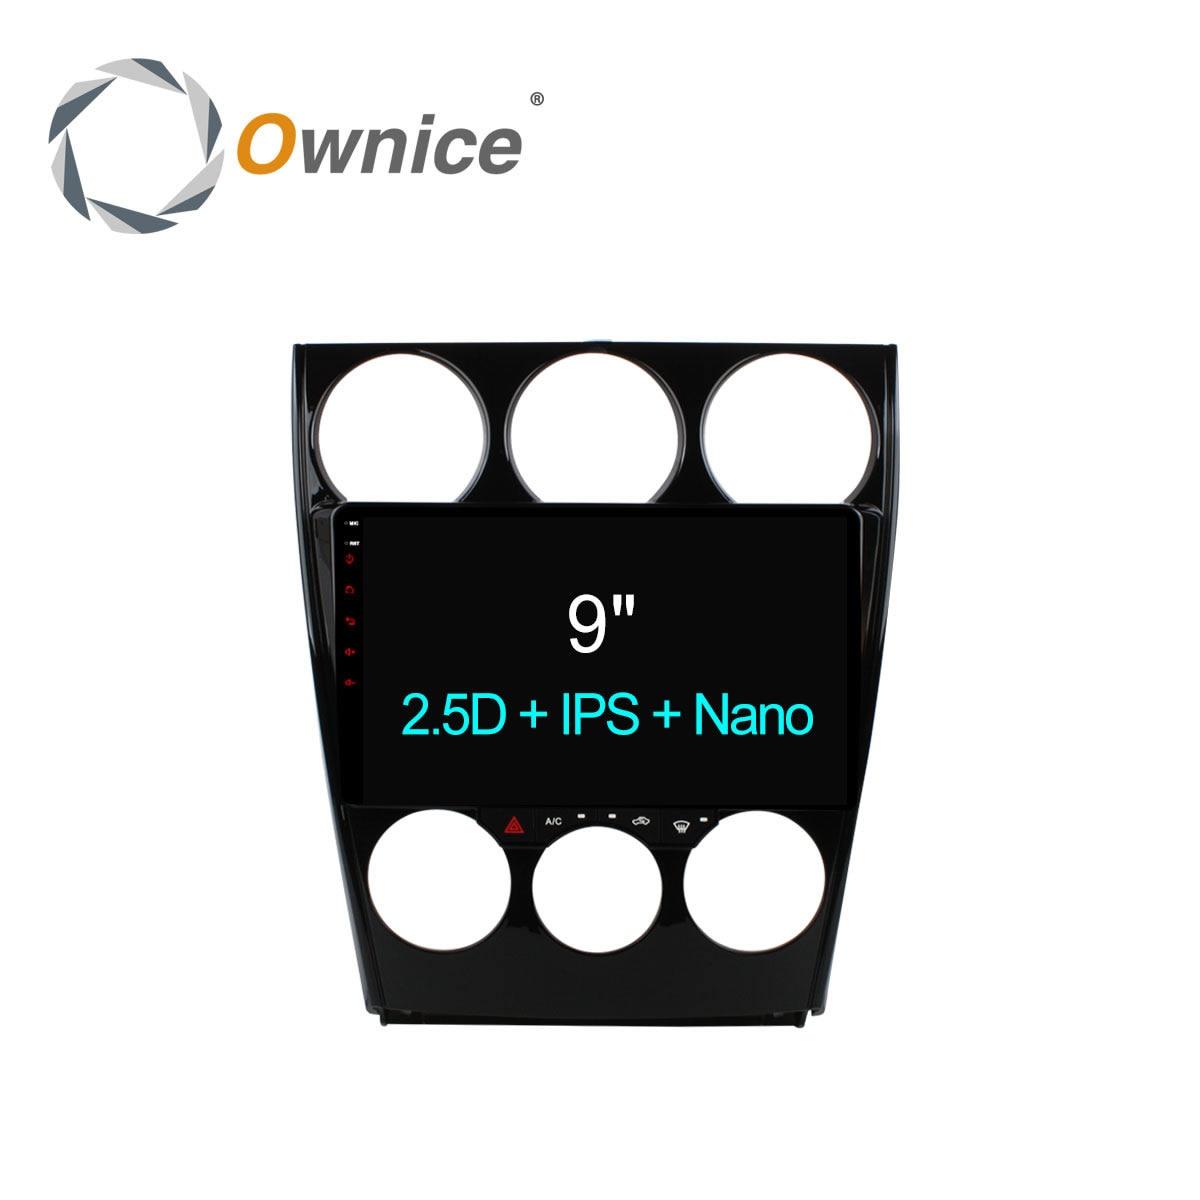 9 дюймов ownice C500 + Android 6.0 dvd-плеер для Mazda 6 2006 2007 2008 2009 2010-2015 GPS навигации Octa core 4 г LTE 32 ГБ